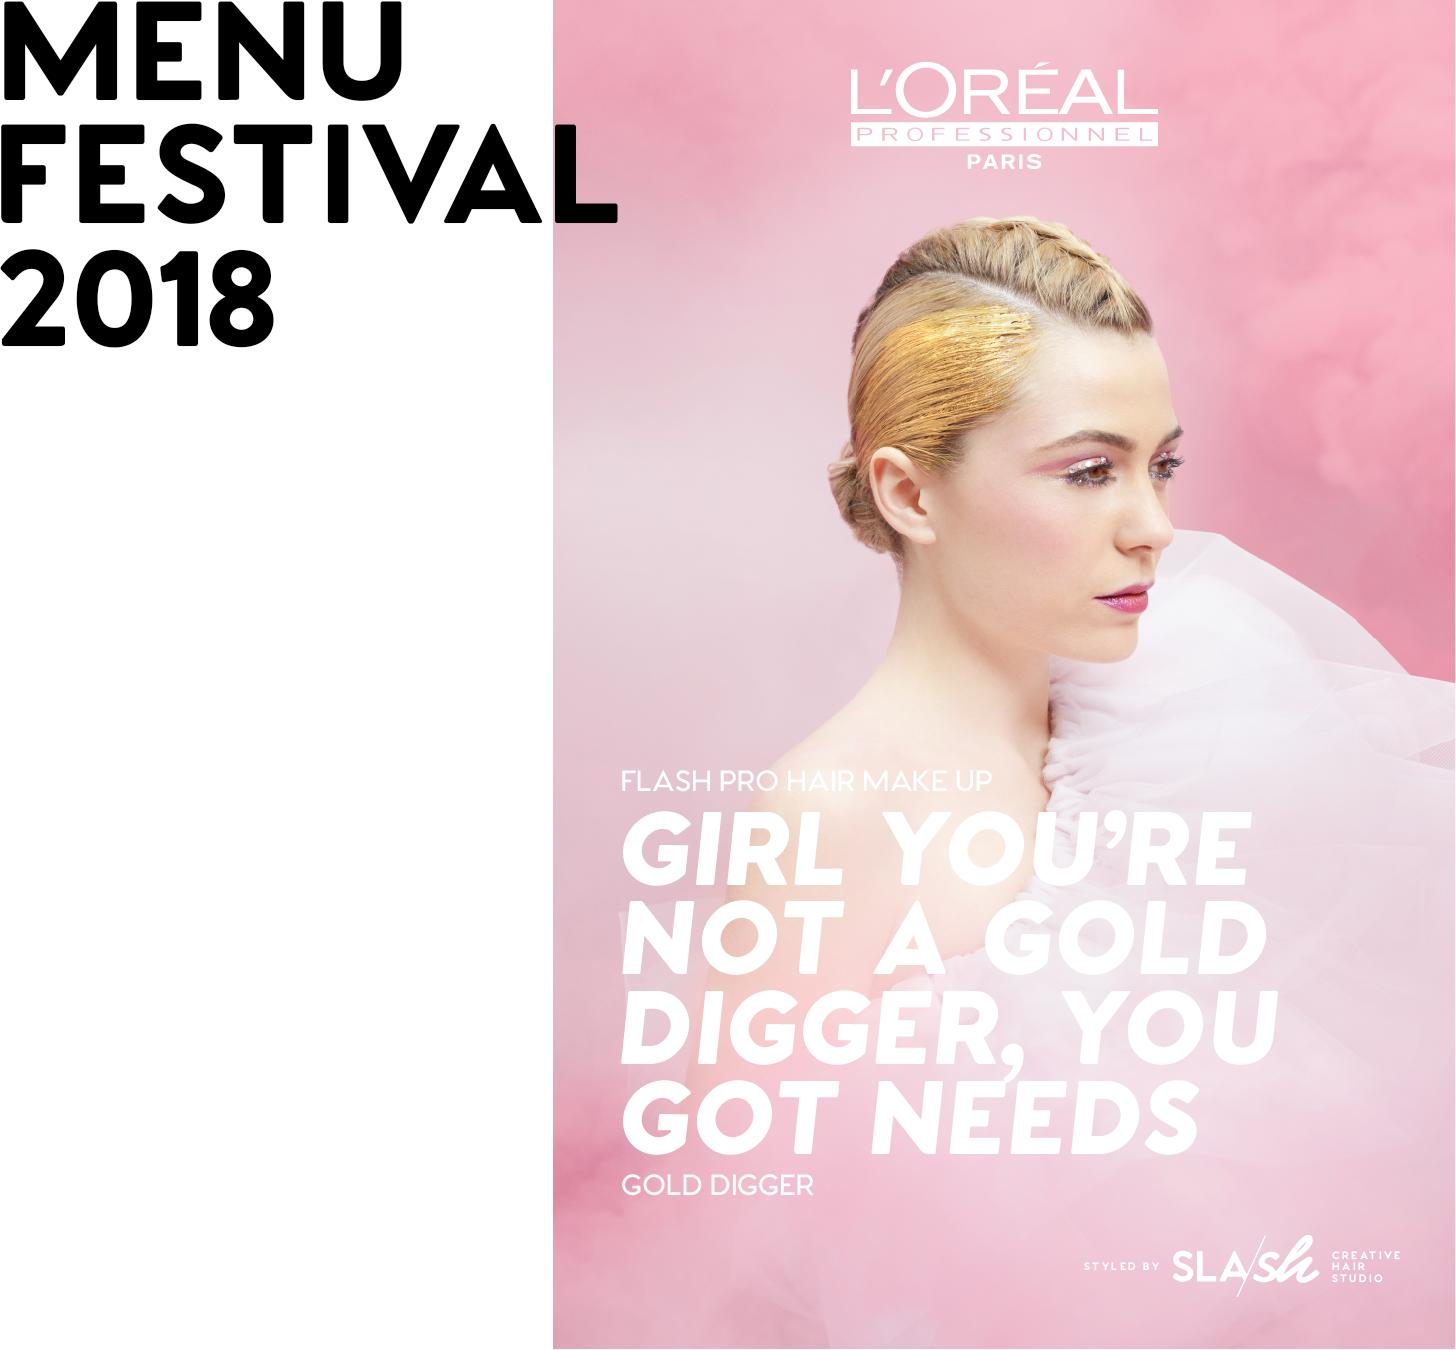 menu-festival-2018_3_girl_youre_not_a_gold_digger_you_got_needs